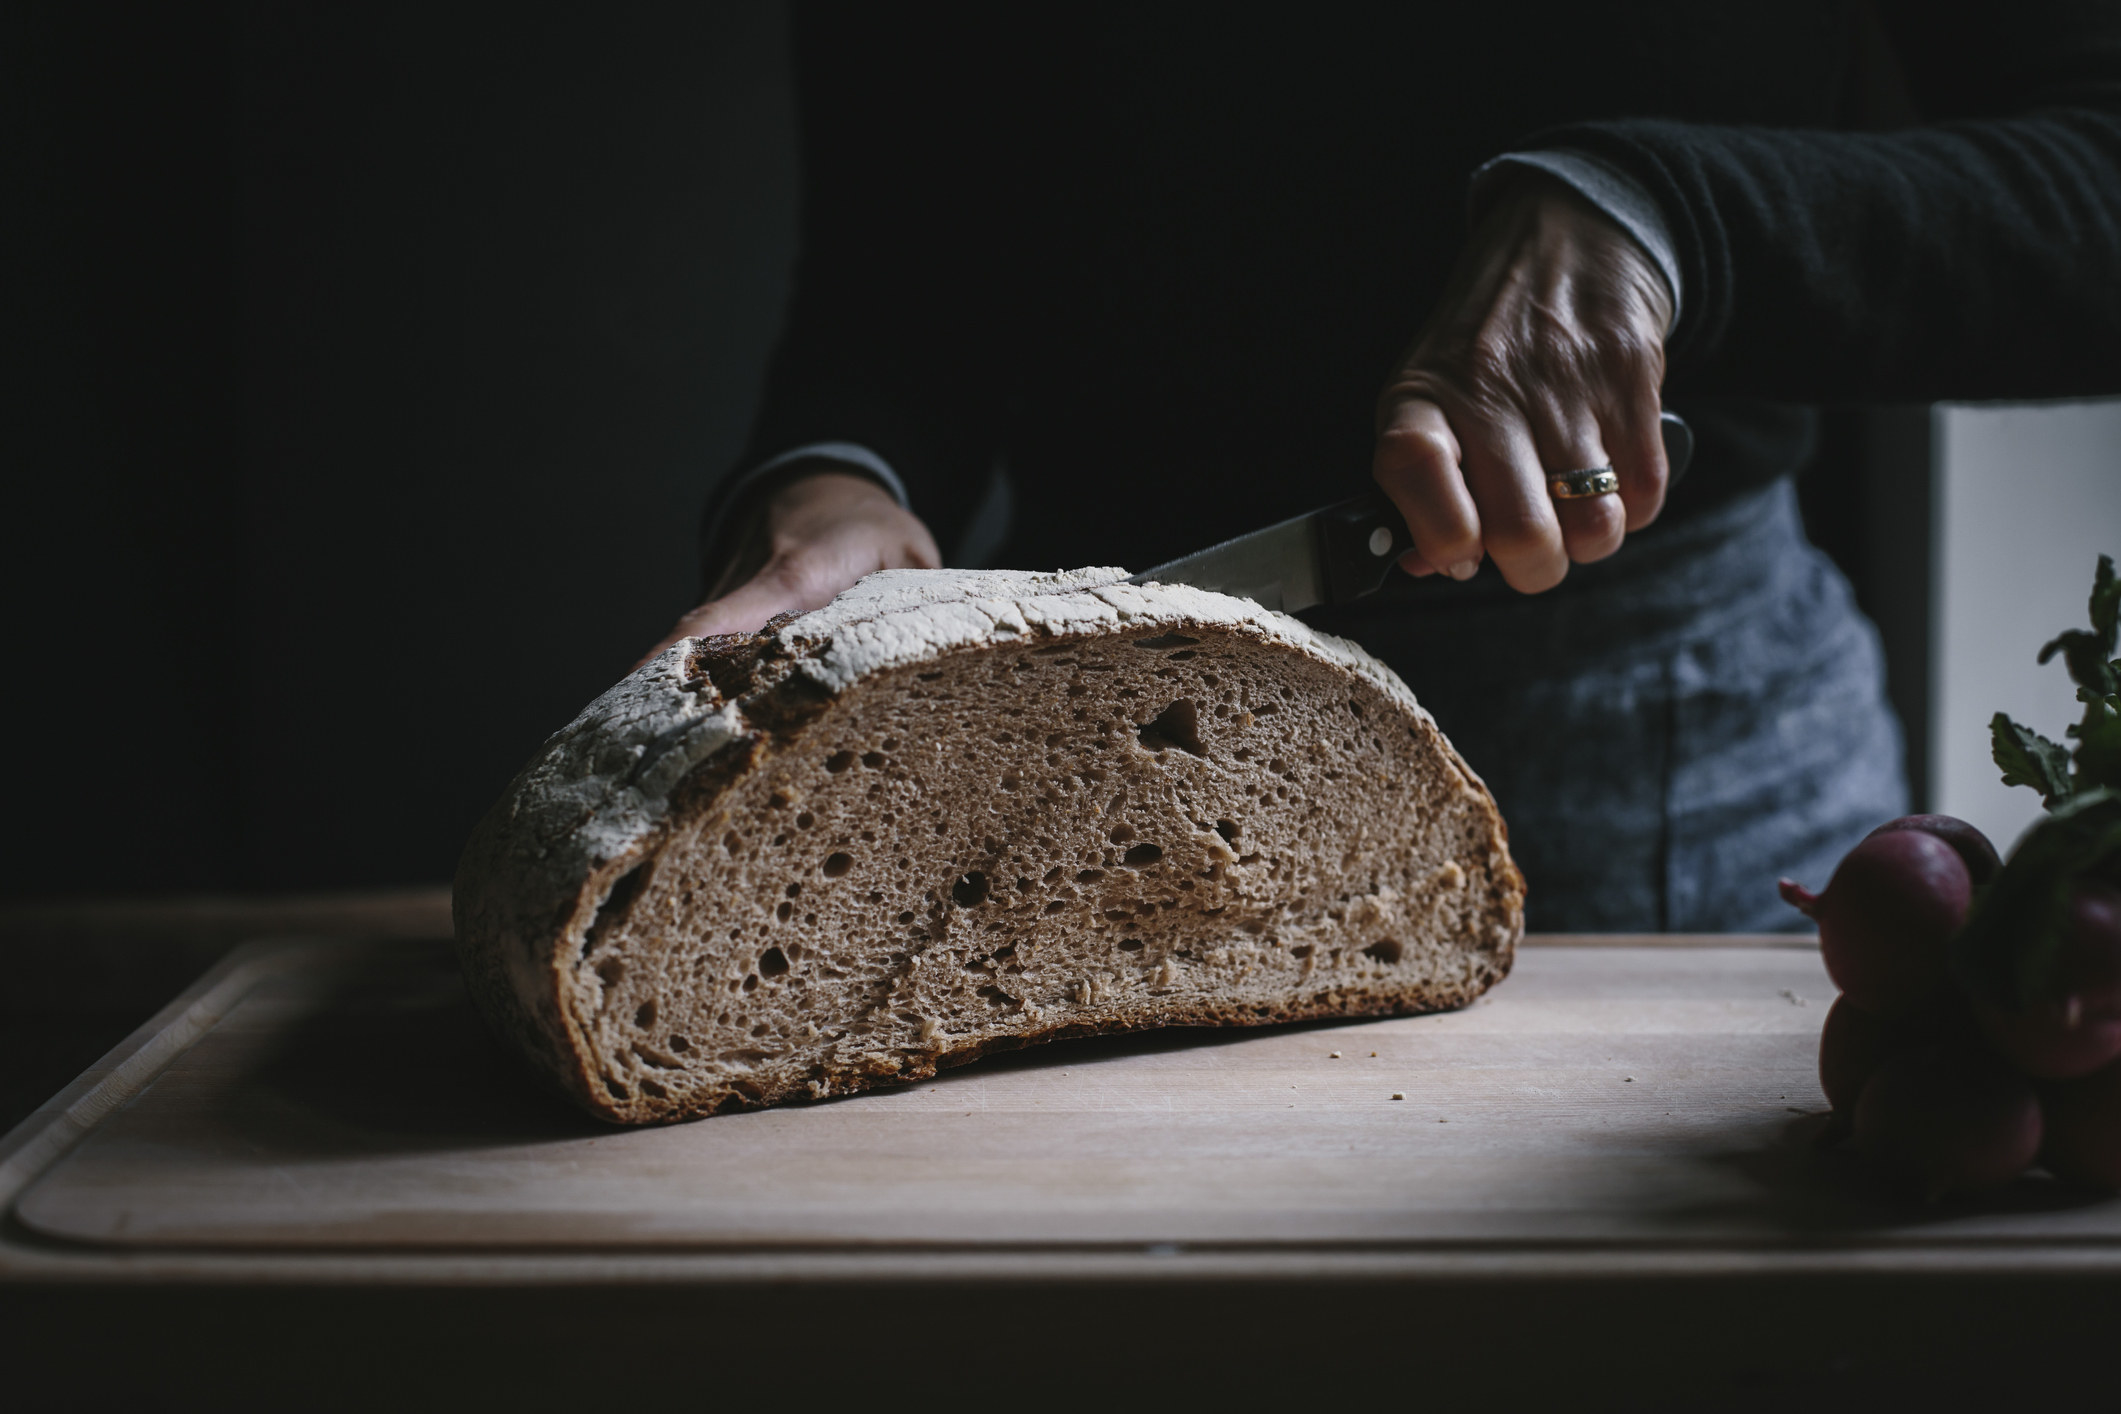 A person slicing into a big bread loaf